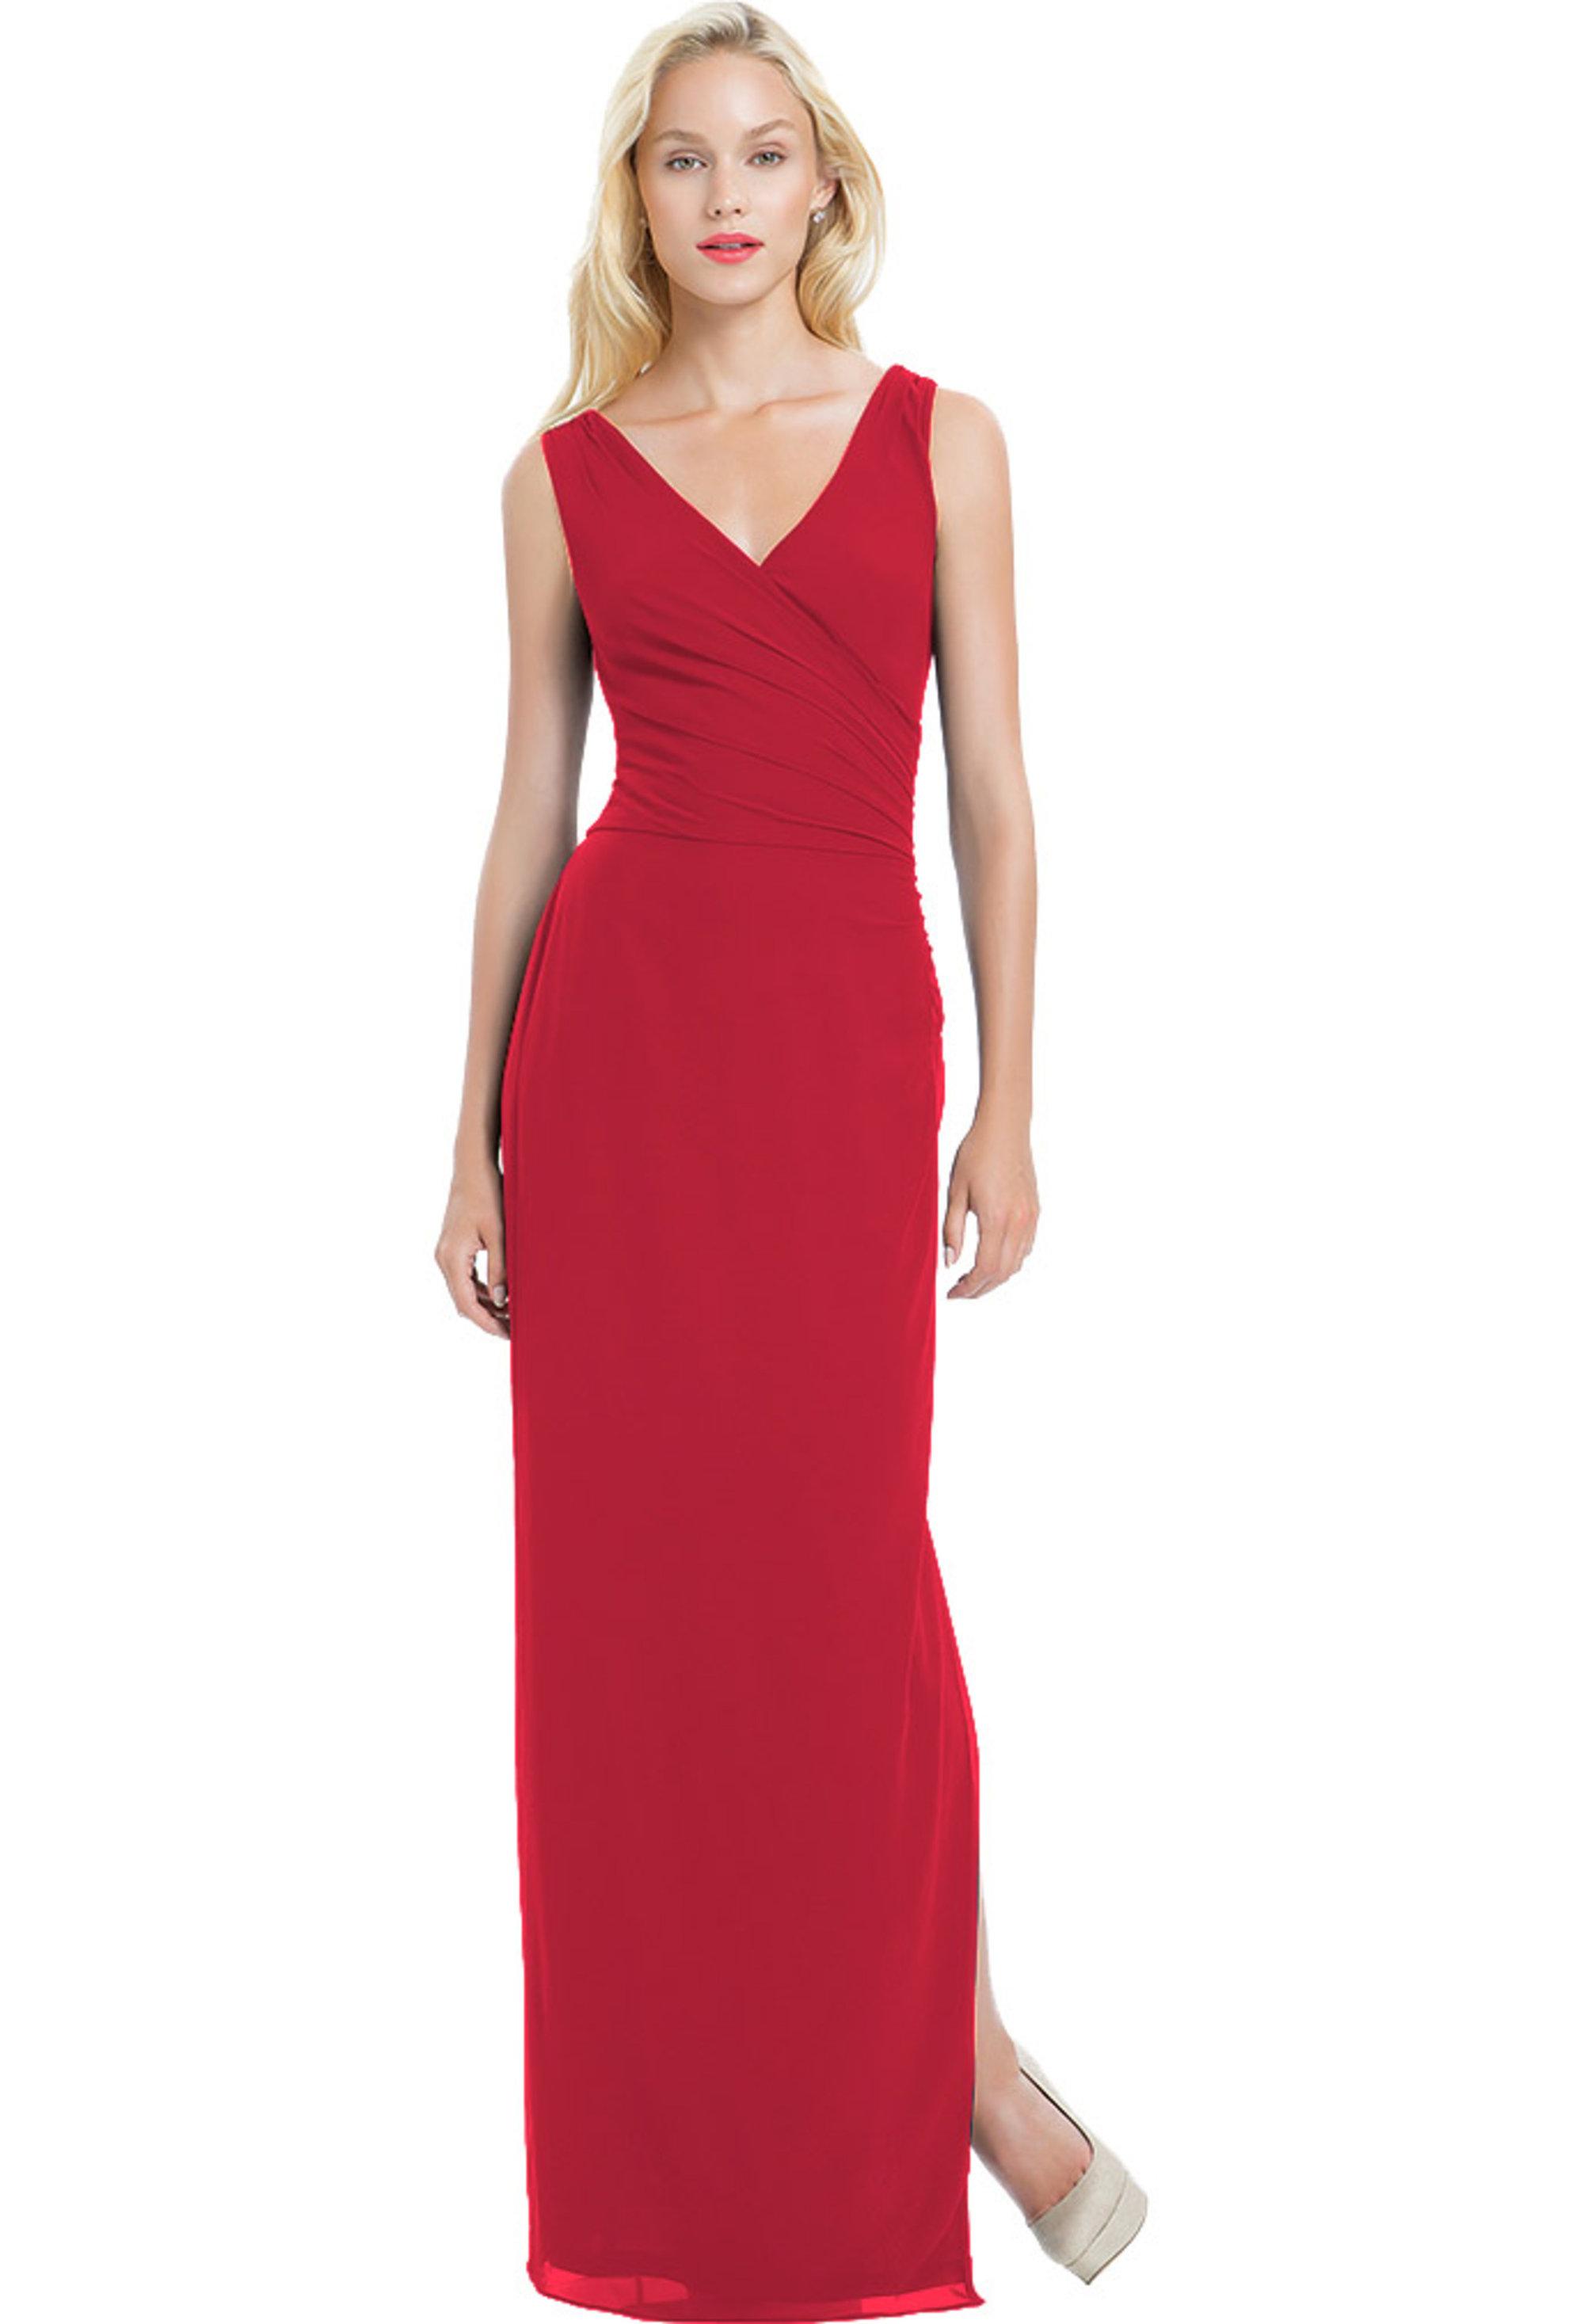 Bill Levkoff CHERRY Chiffon Sleeveless Side Slit gown, $190.00 Front